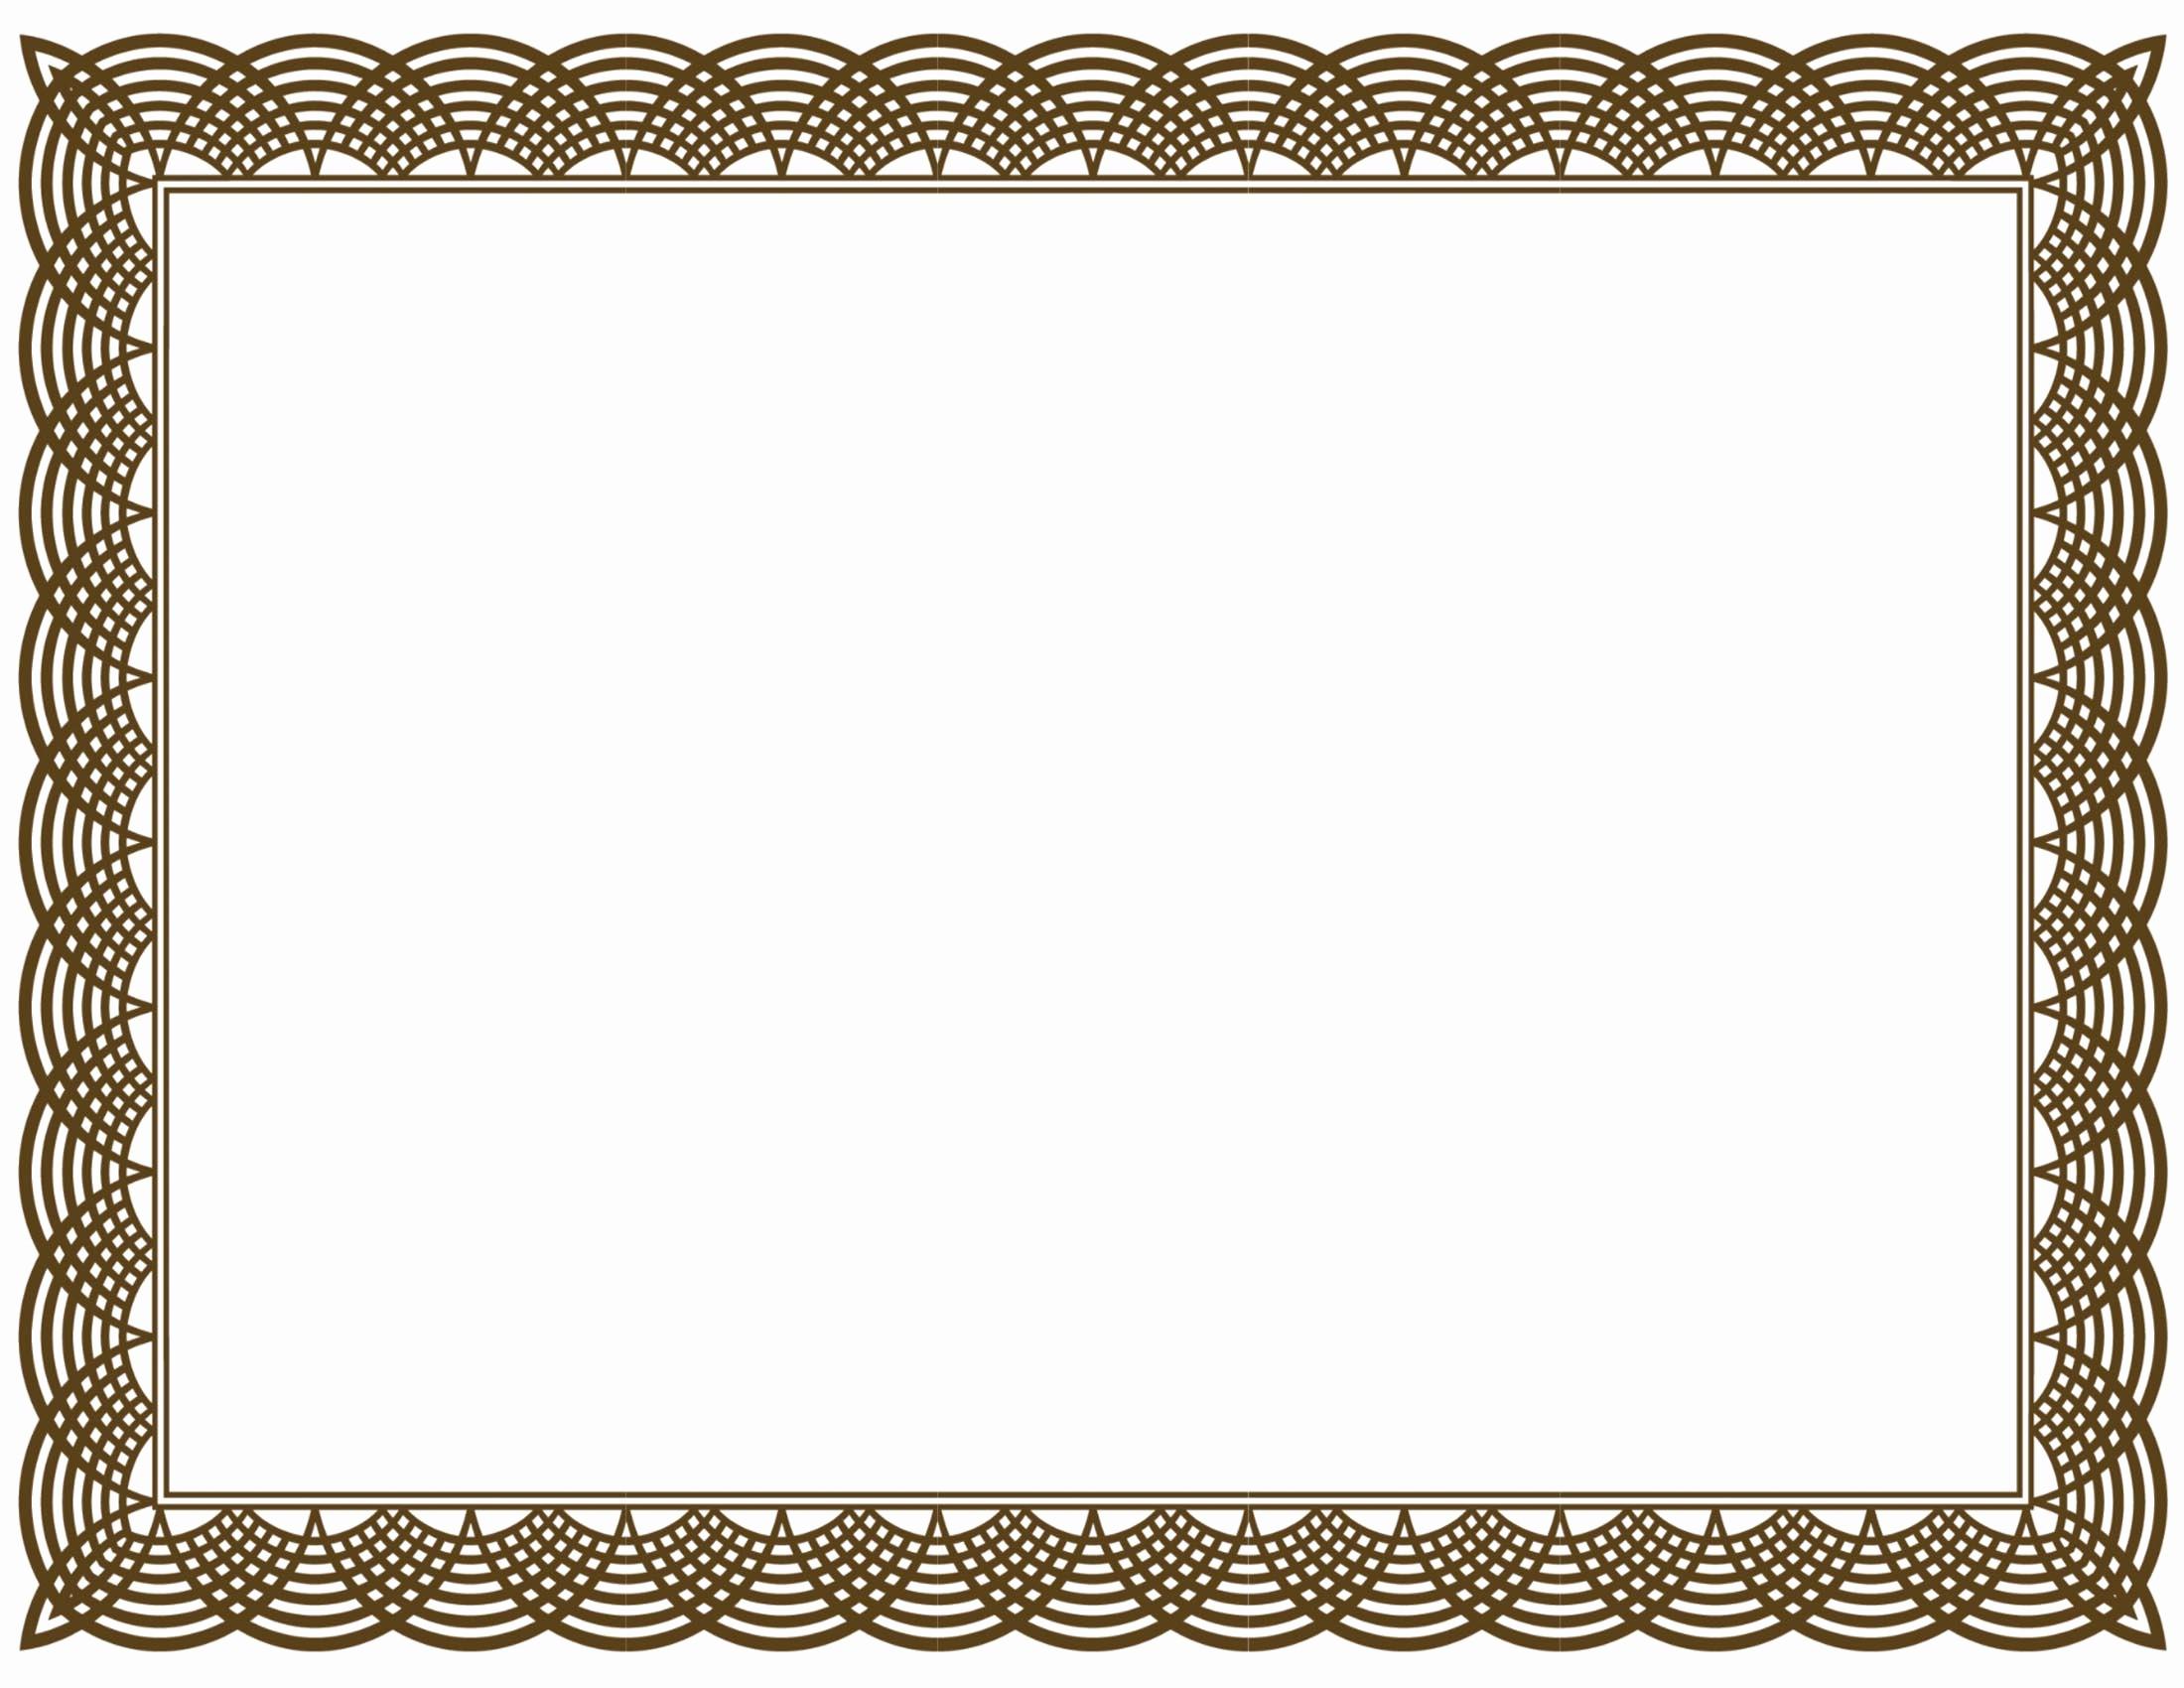 Free Printable Blank Certificate Borders Elegant 5 New Certificate Border Templates